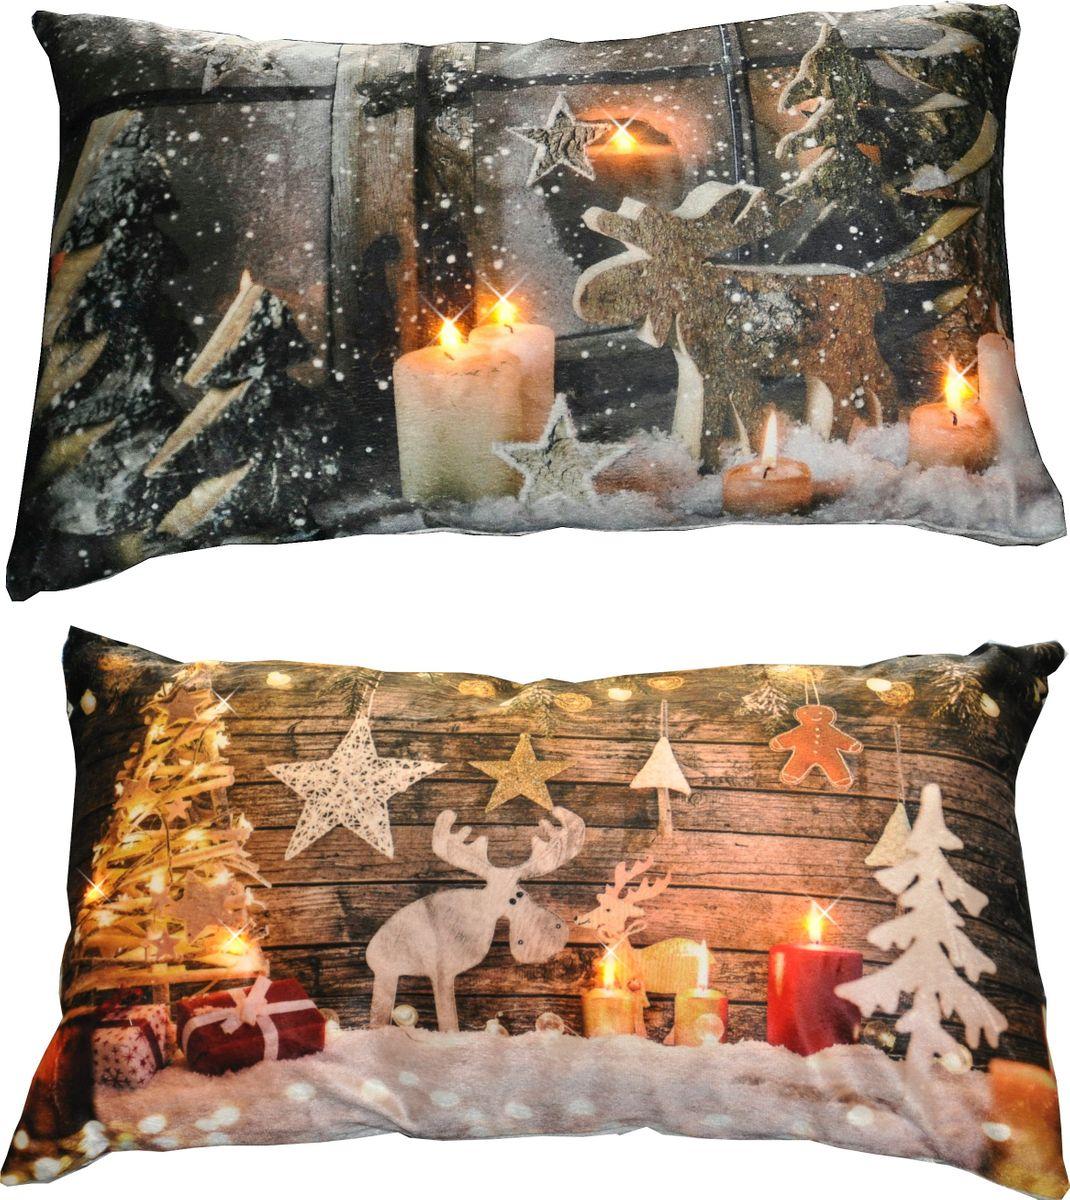 kissen 30x50cm led beleuchtung weihnachten dekokissen wintermotive fotokissen weihnachten 3d. Black Bedroom Furniture Sets. Home Design Ideas